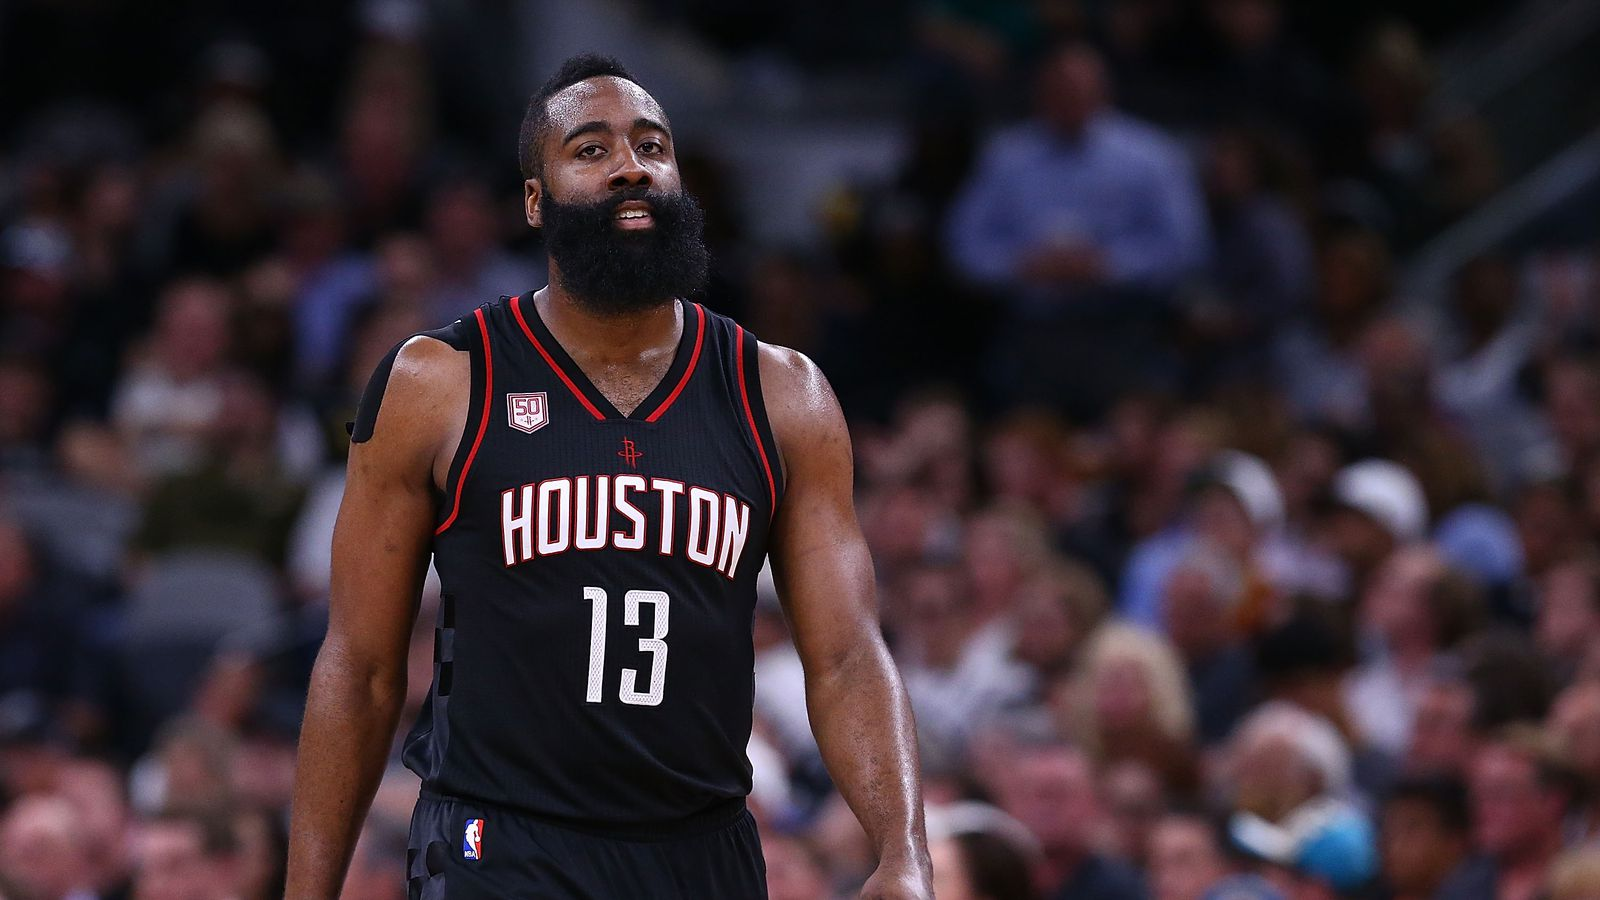 NBA Free Agency Rumors: Rockets hope to give James Harden